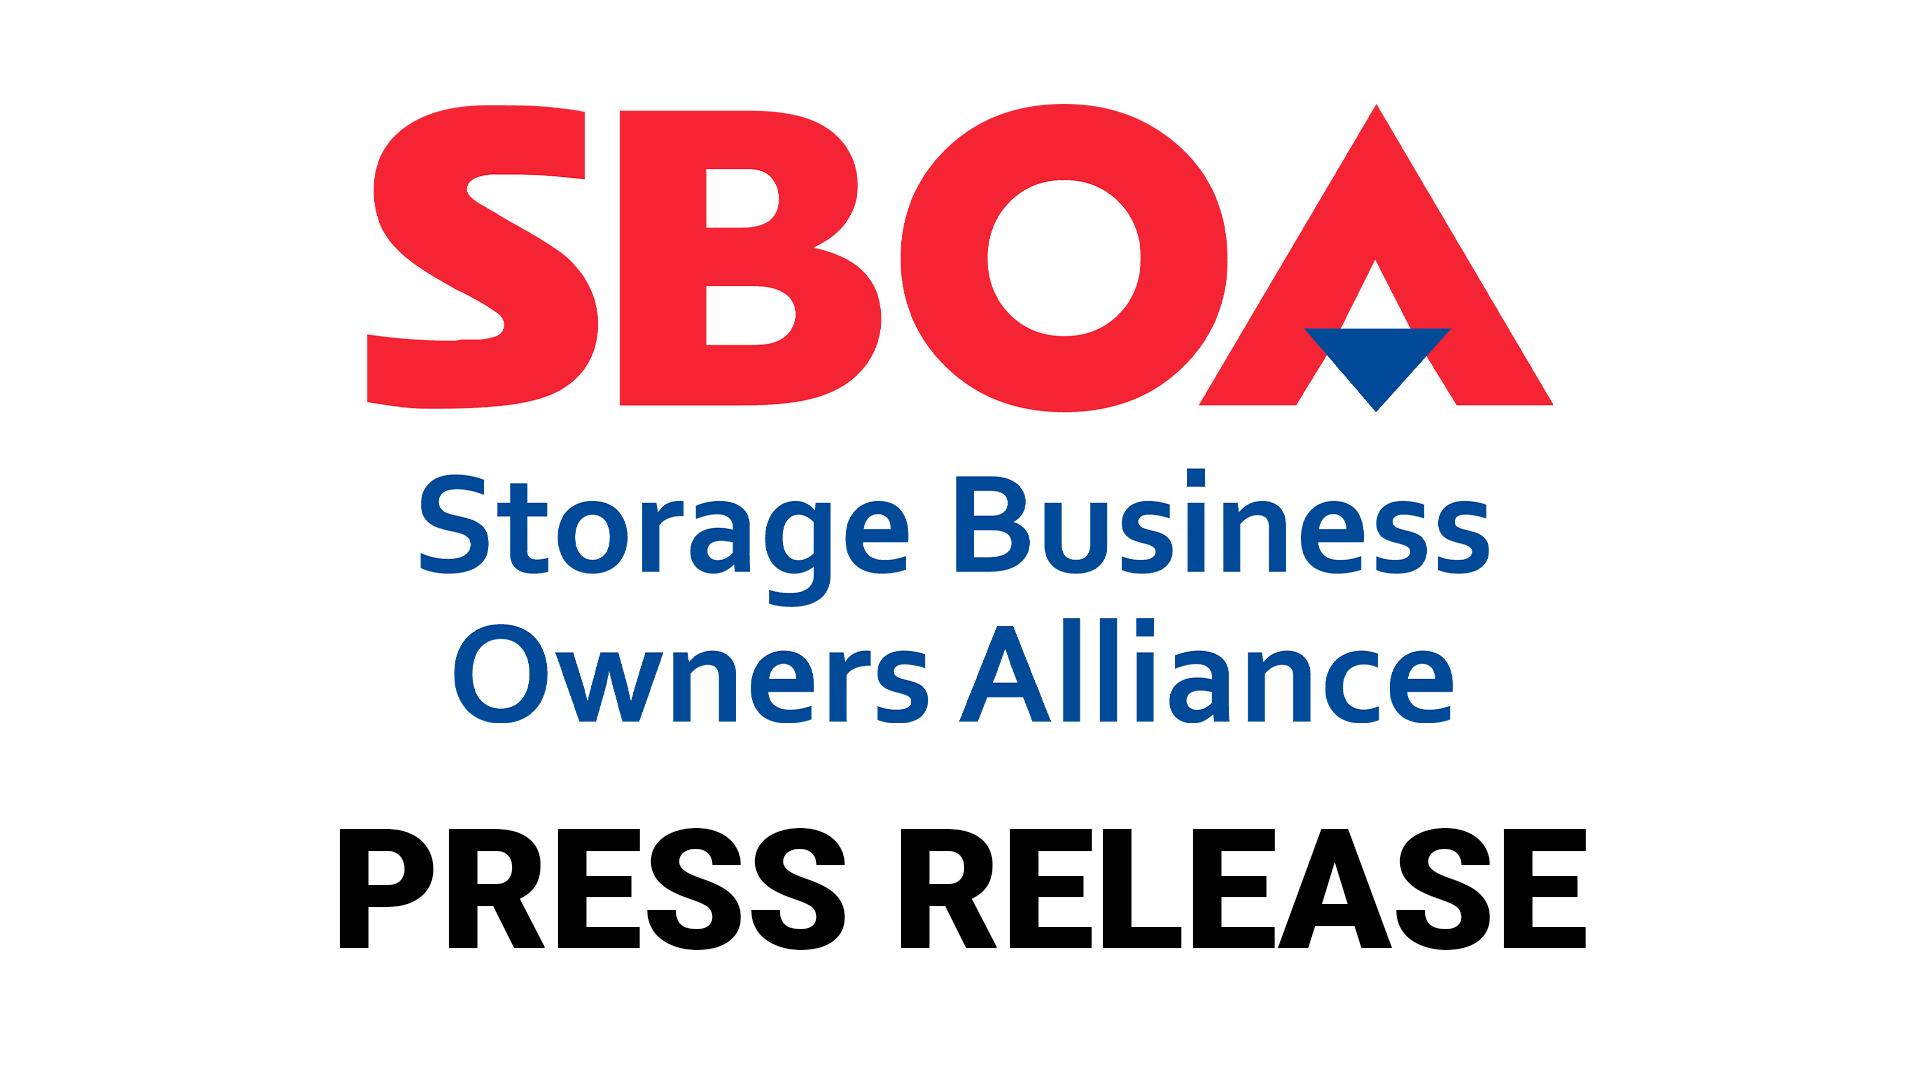 SBOA press release